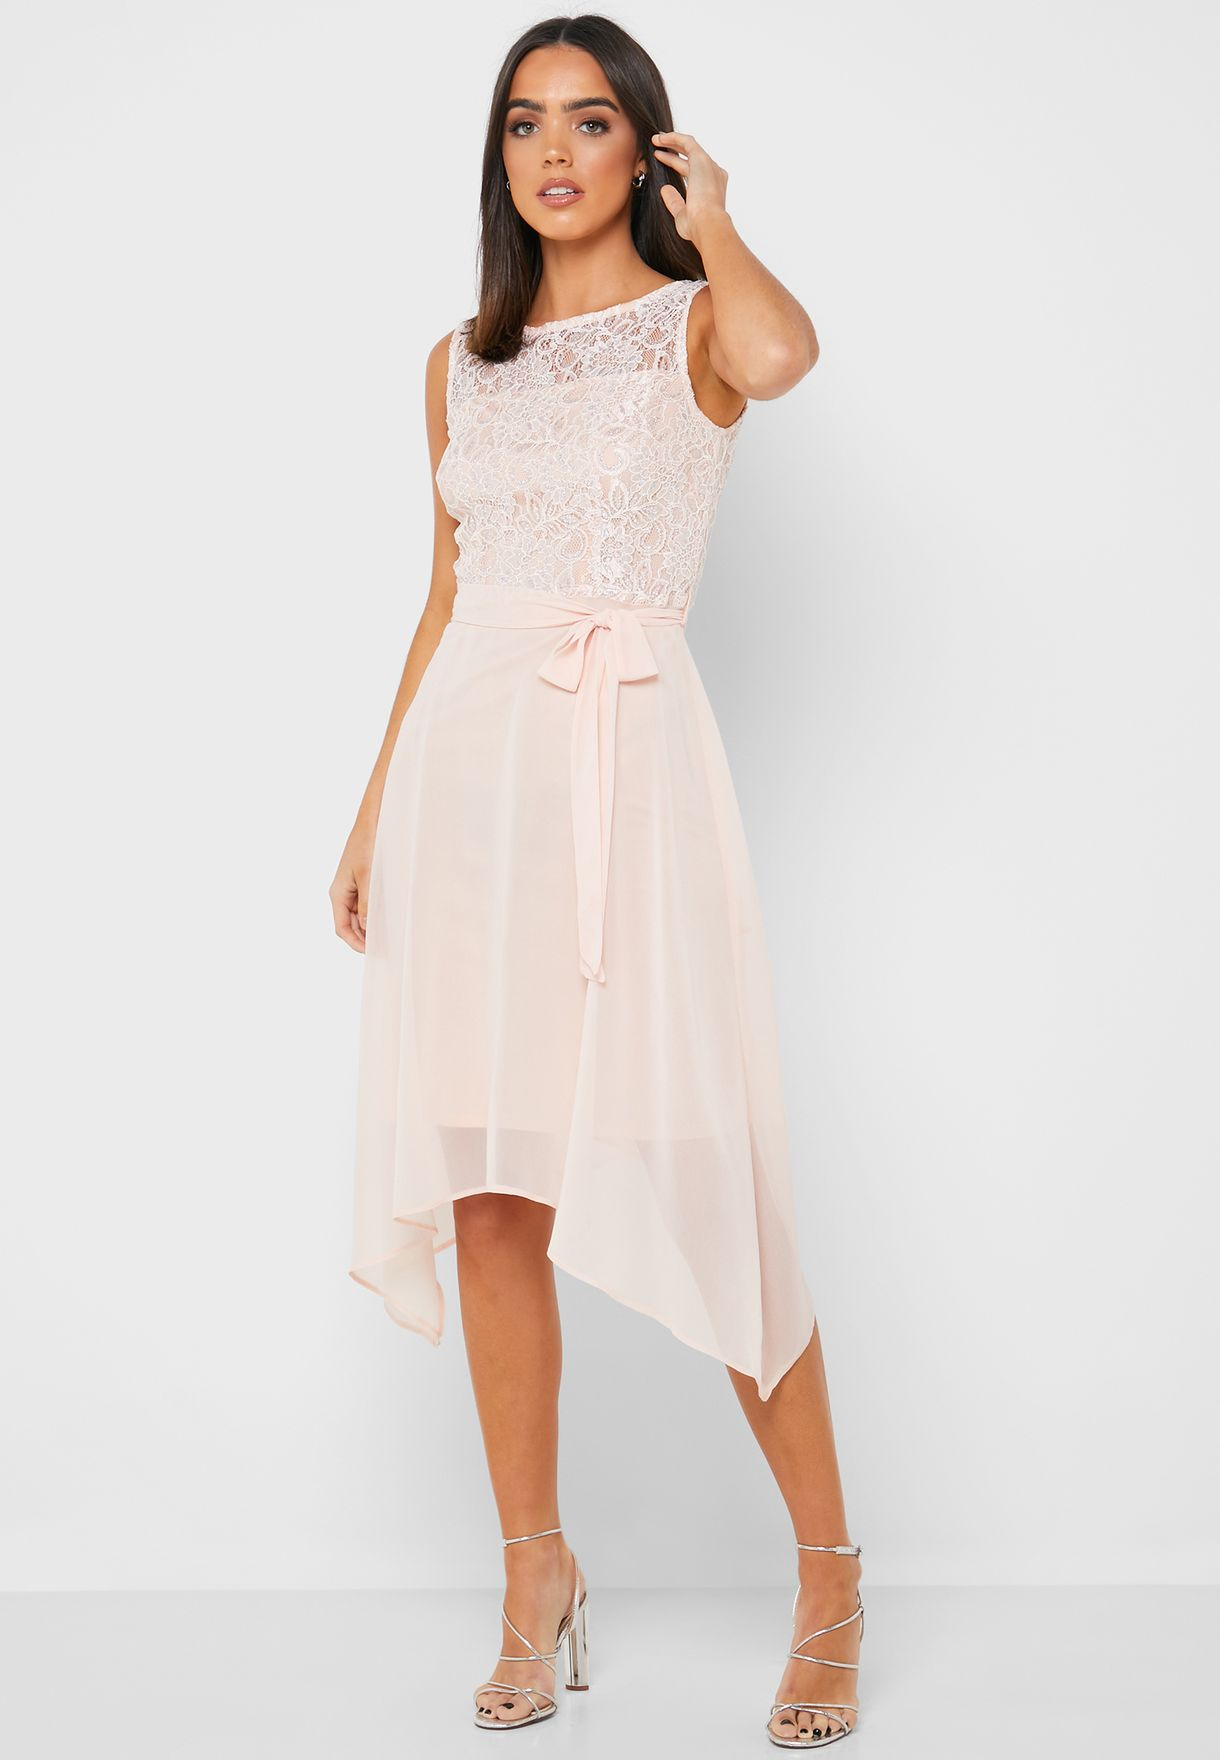 Lace Top Self Tie Dress